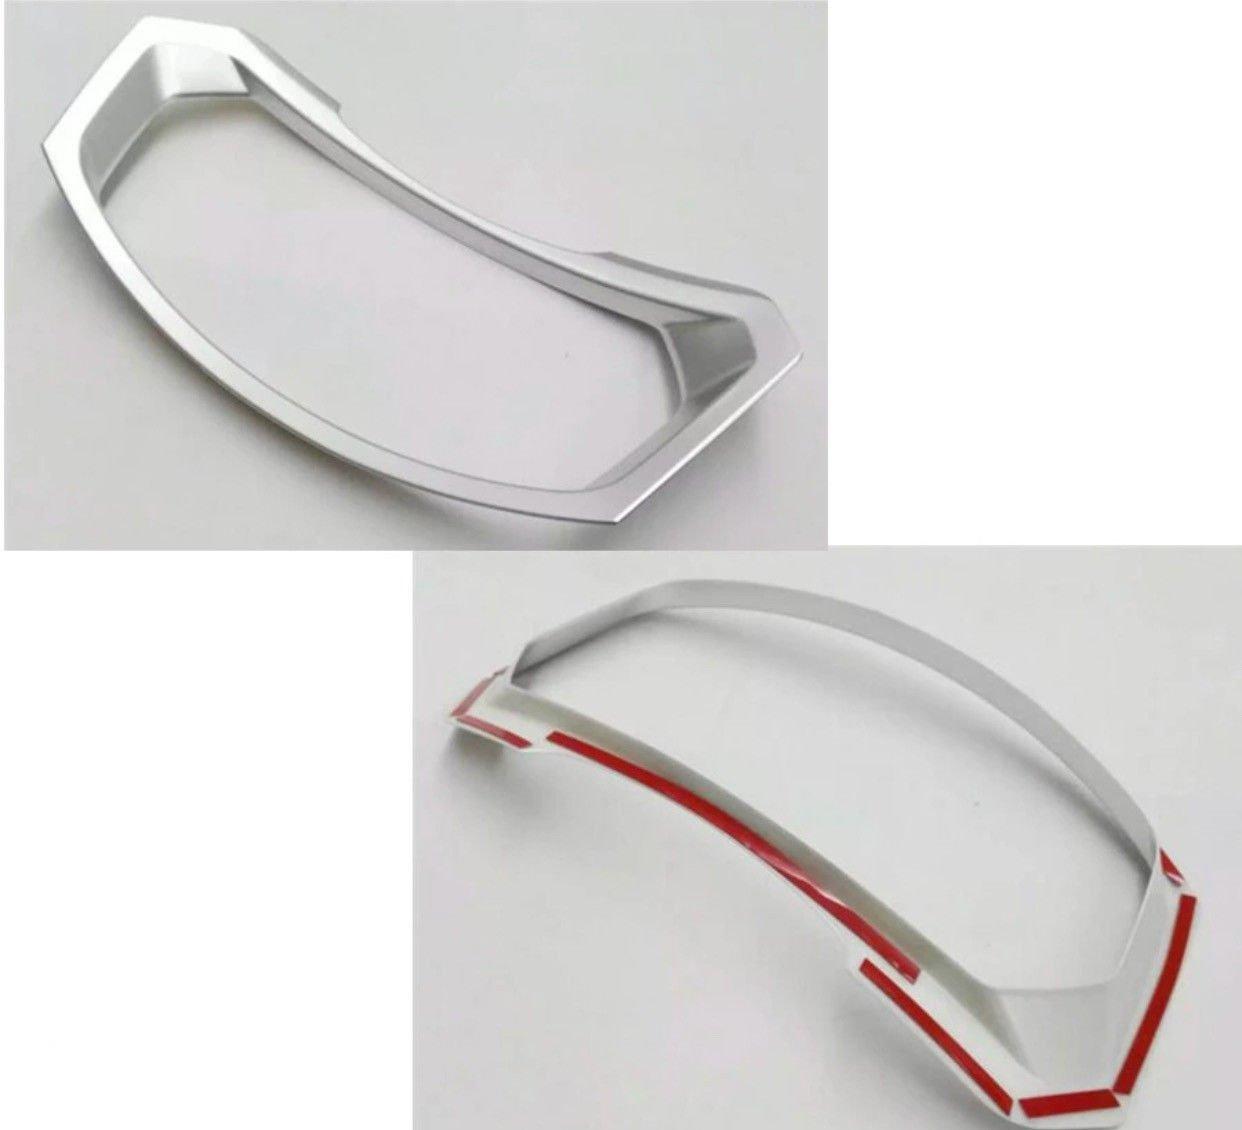 Emblem Trading Tacho Rahmen Mittelkonsole Armaturenbrett Verkleidung Abdeckung Rahmen ABS Kunststoff Optik Autozubeh/ör